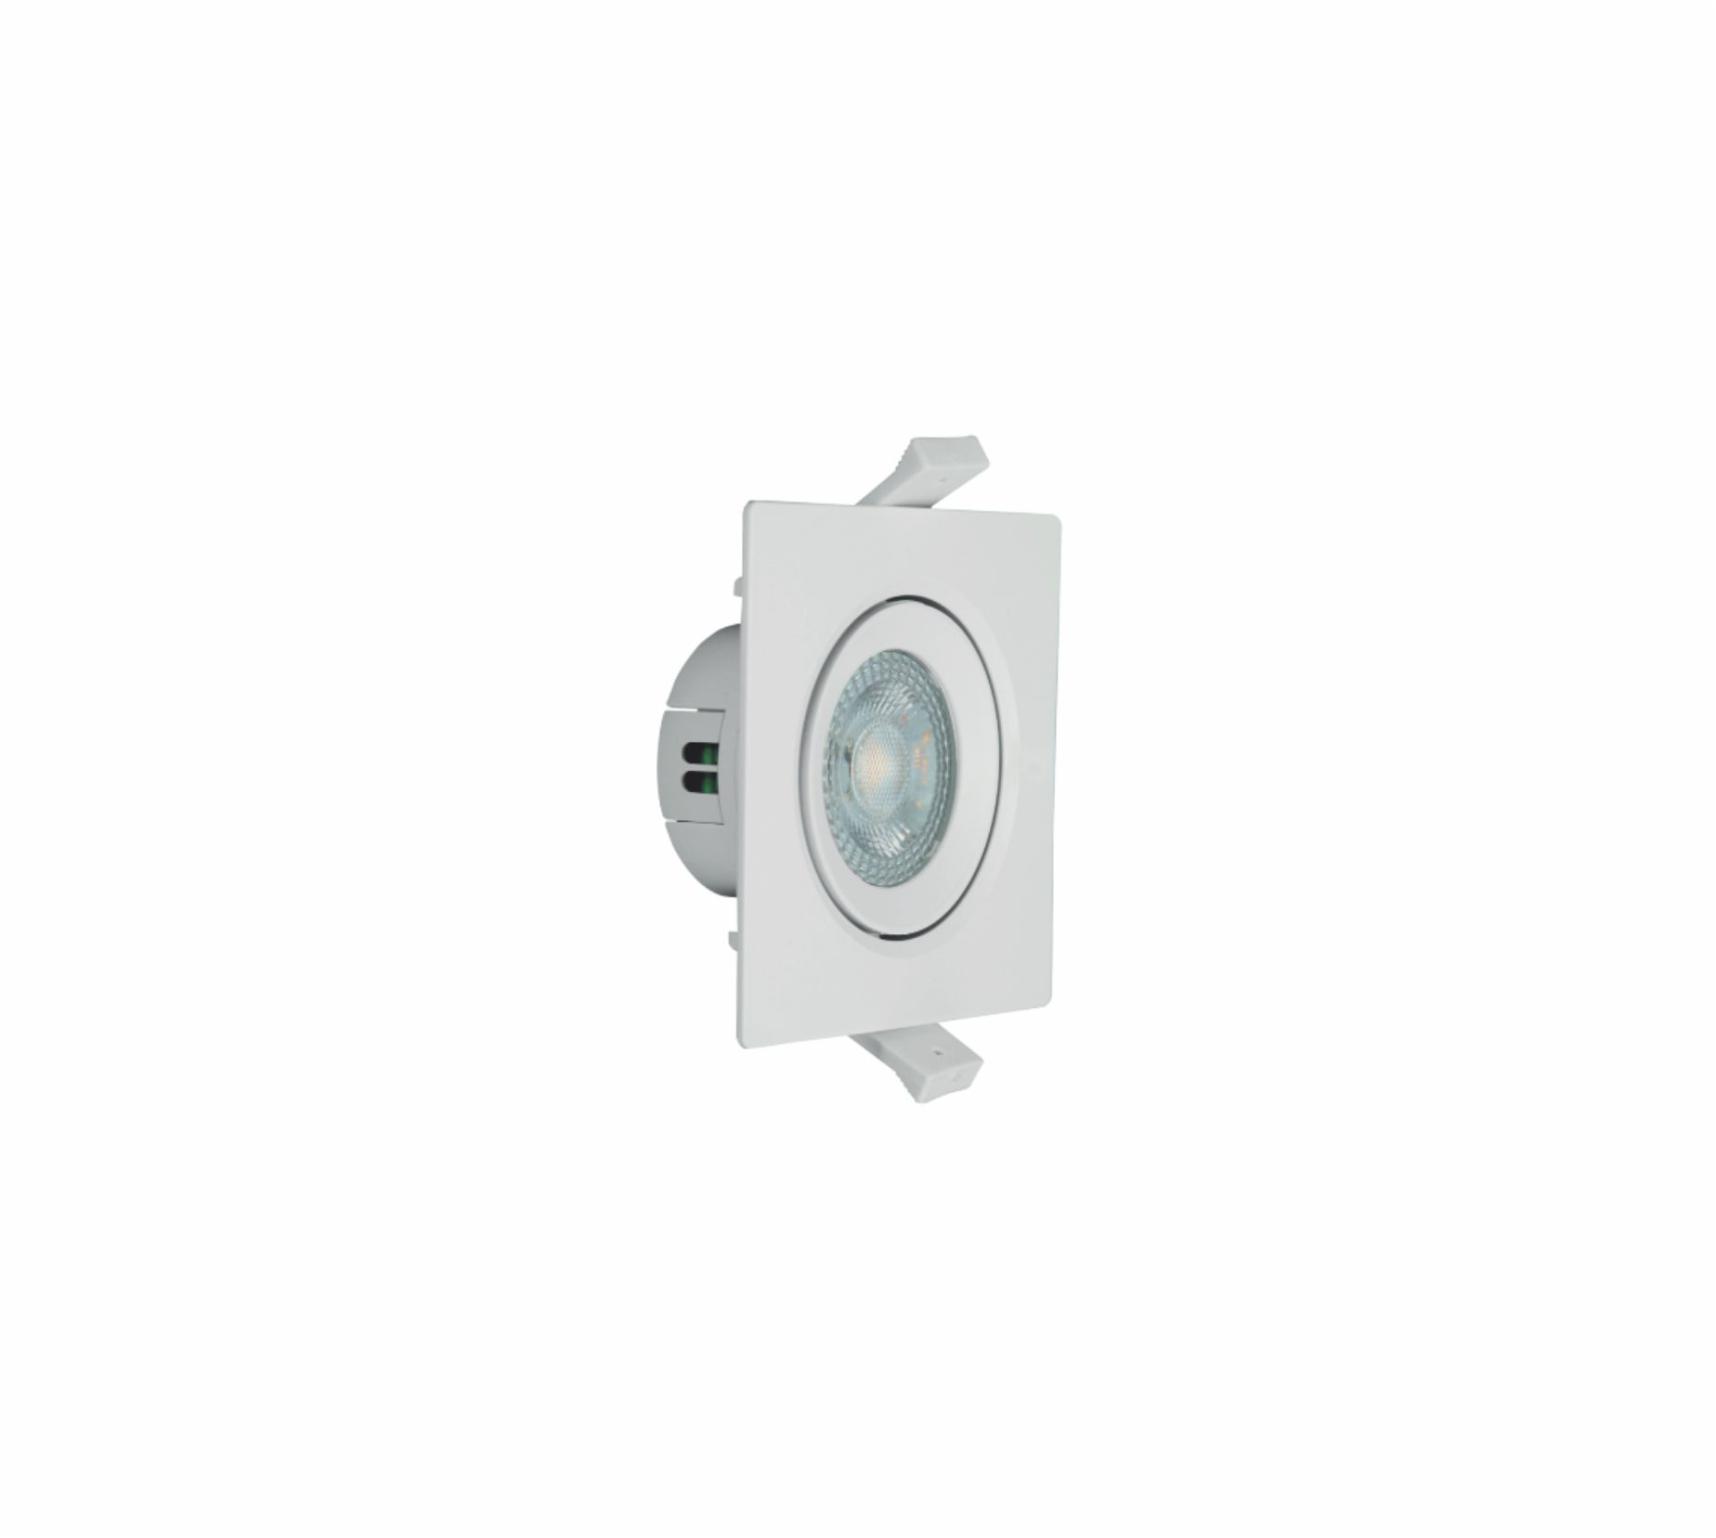 SPOT LED MR11 quadrado branco 3,5W AUTOVOLT 6500K